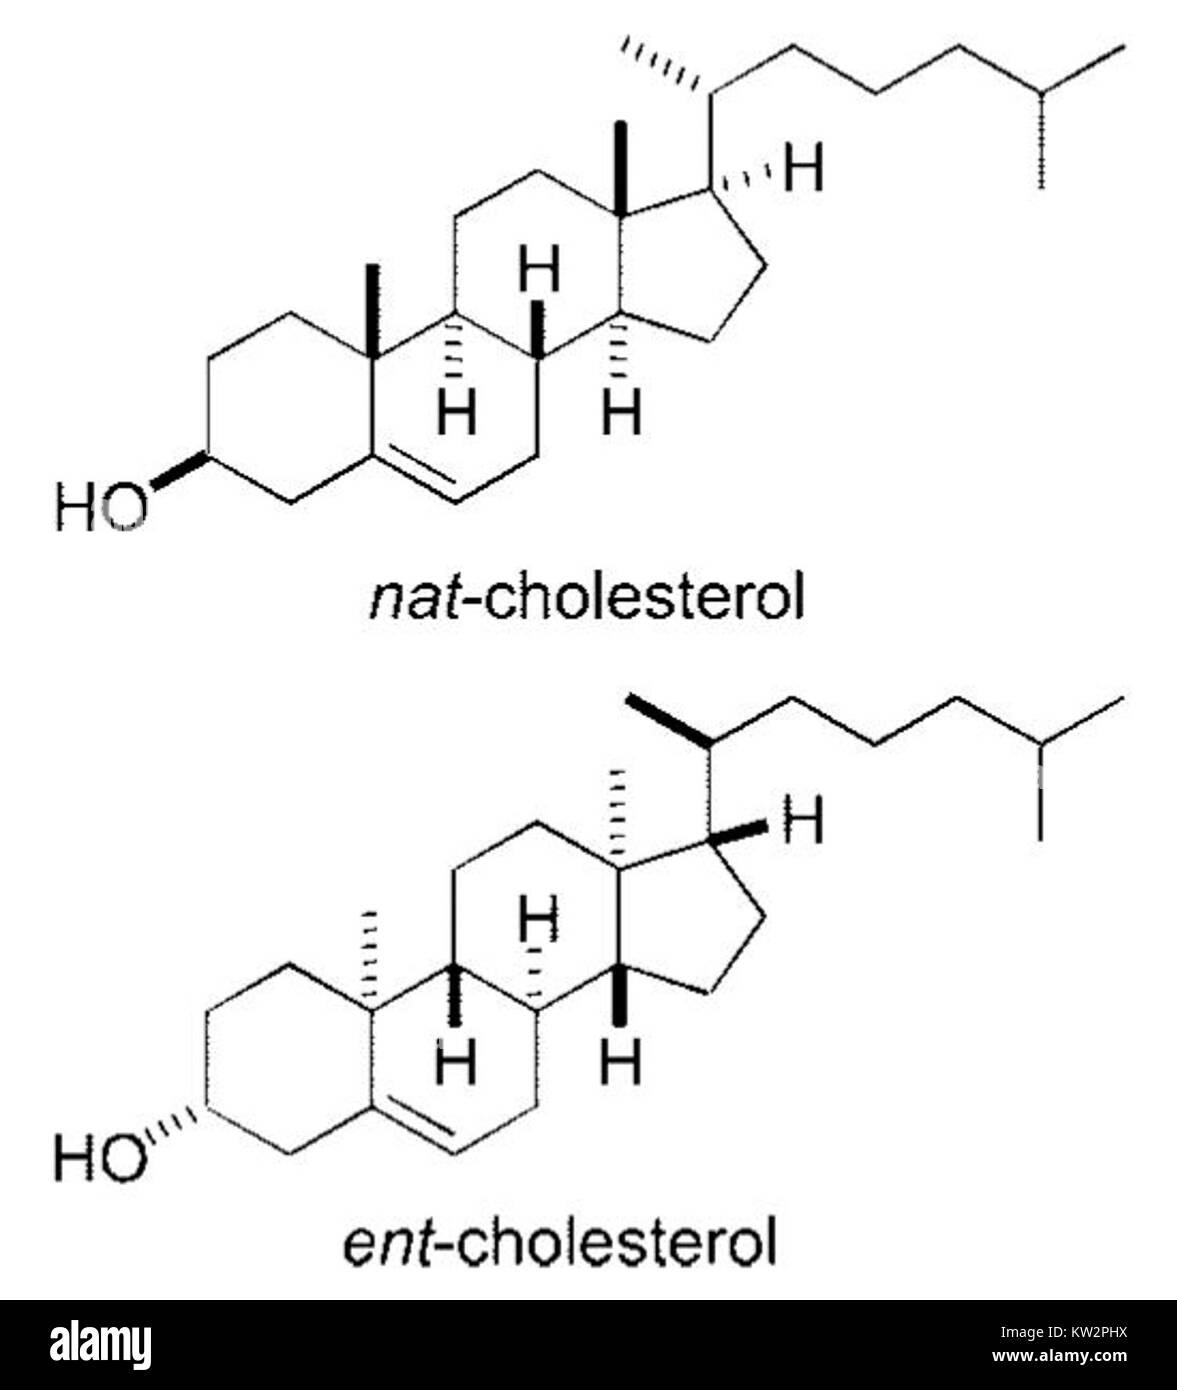 Nat cholesterol and ent cholesterol - Stock Image